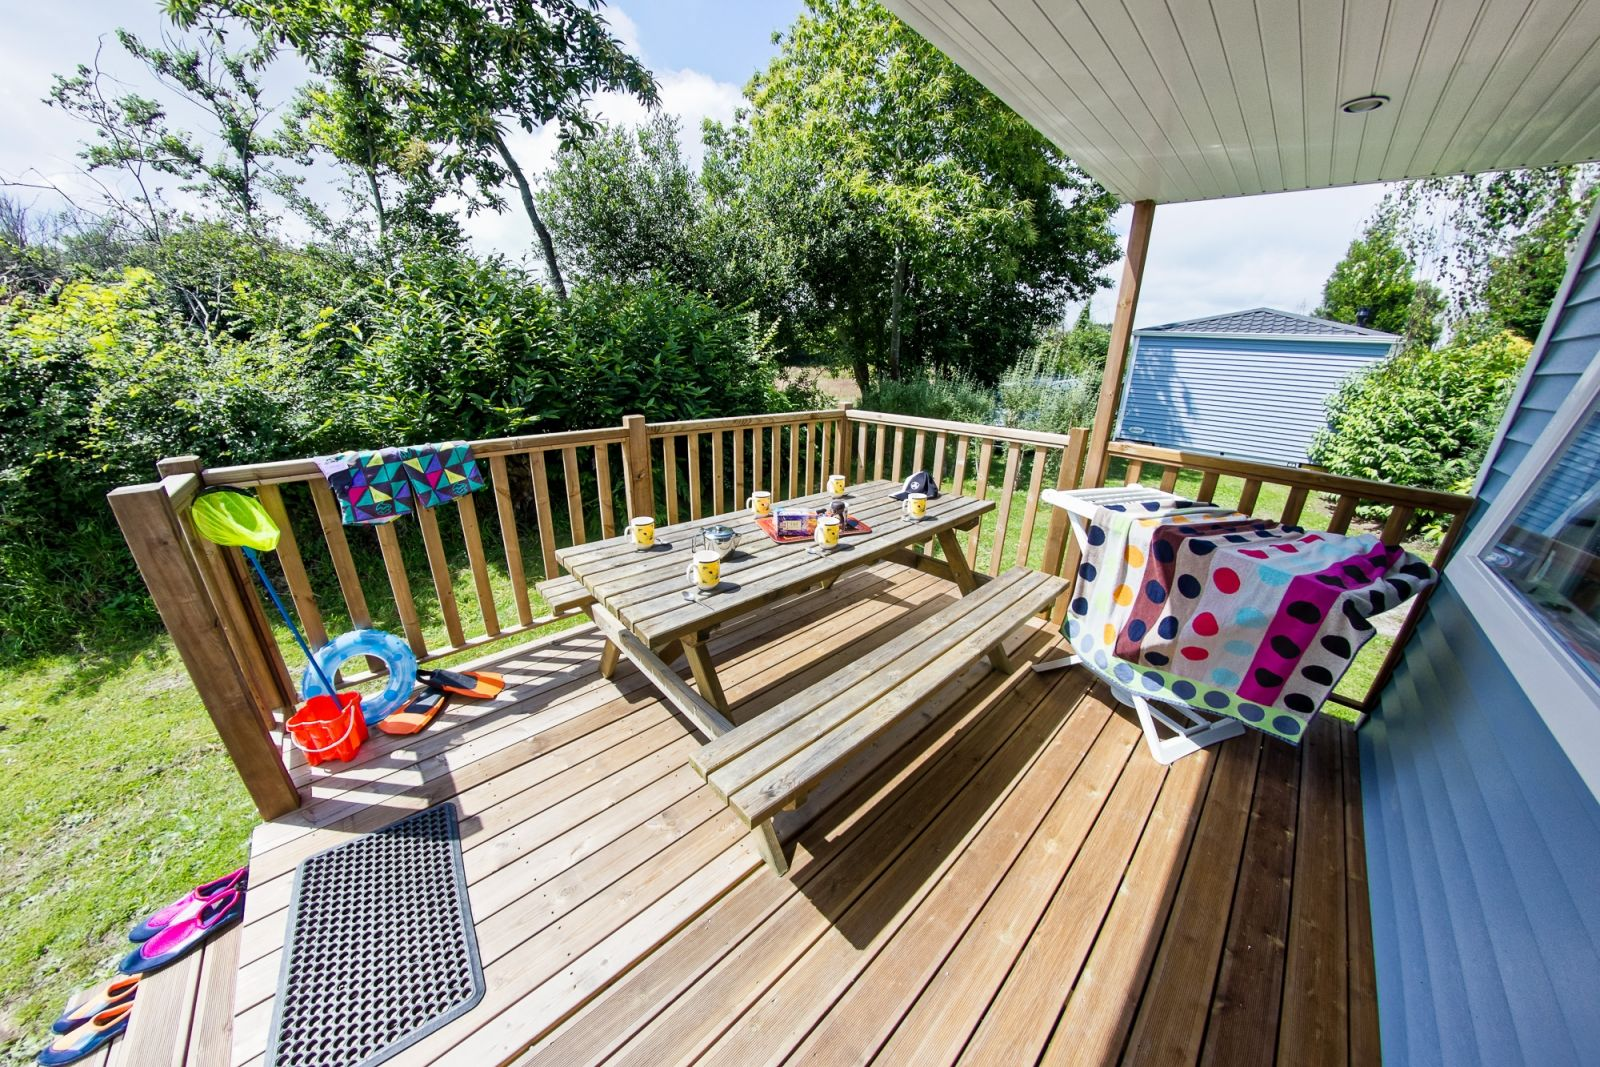 sunelia family terrasse semi couverte mobil home 3 chambres. Black Bedroom Furniture Sets. Home Design Ideas